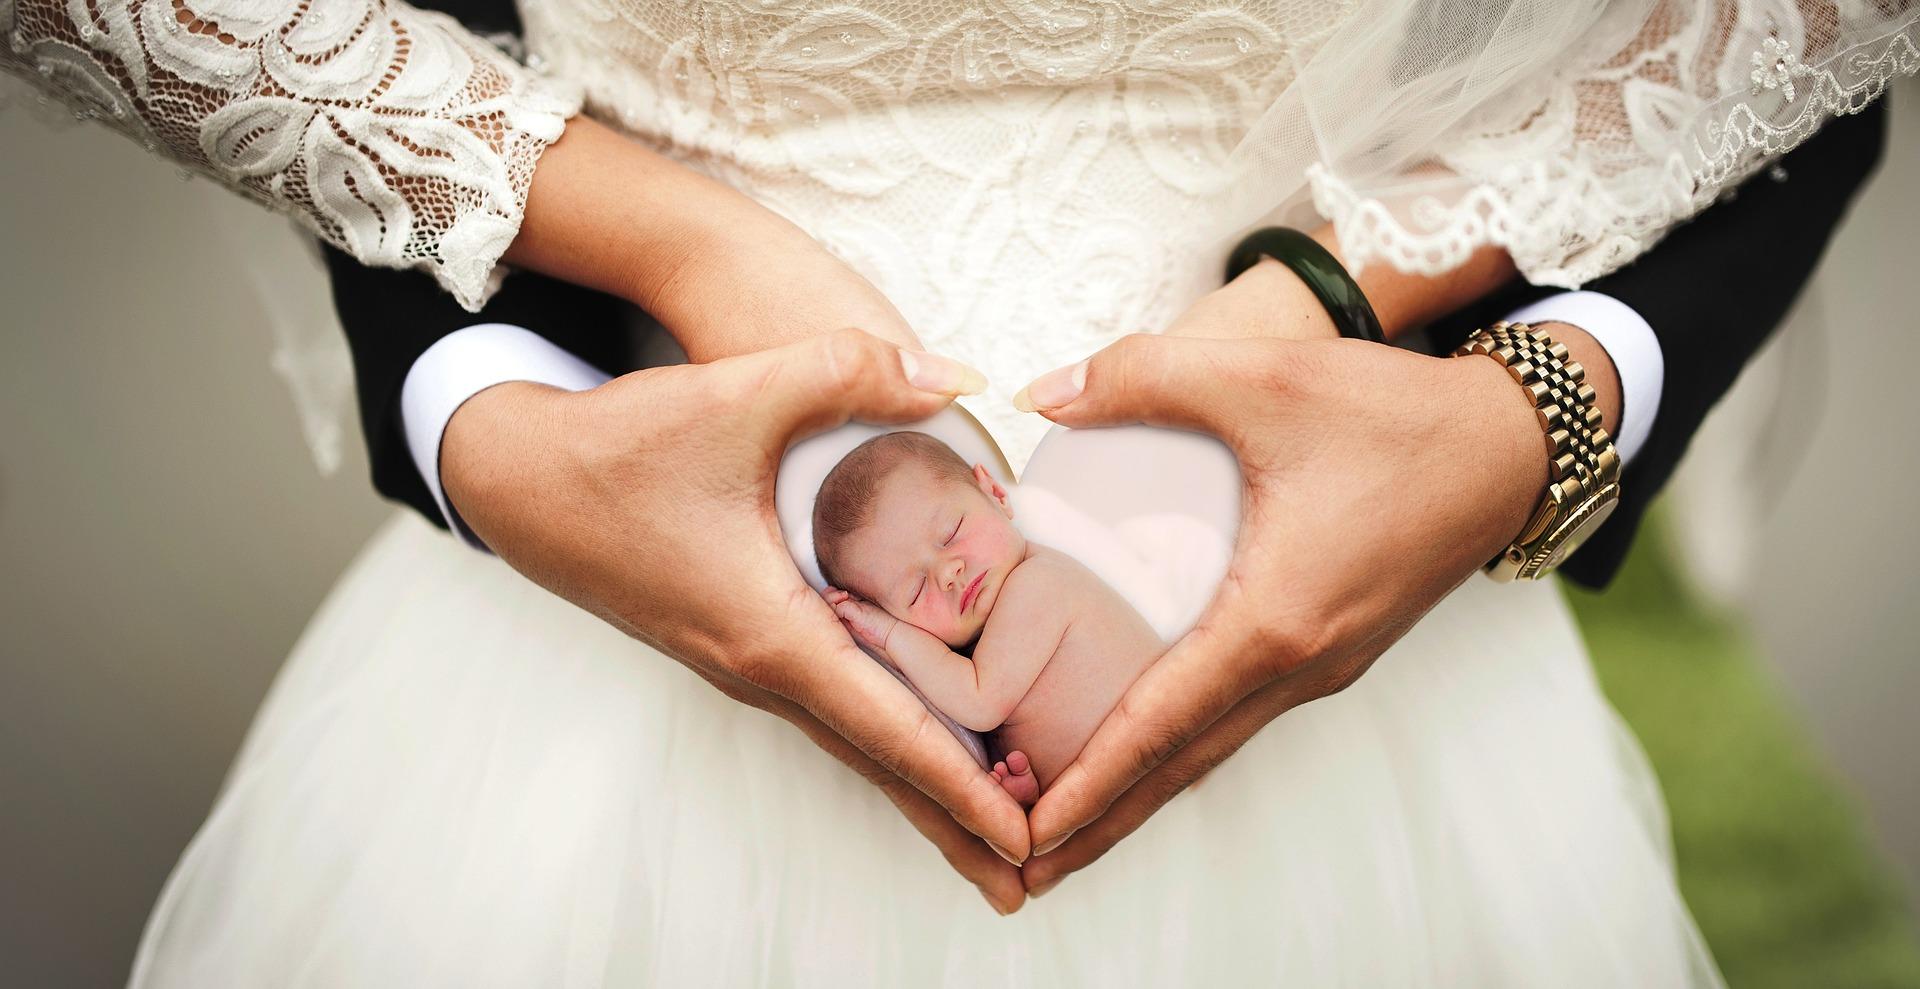 Homme enceinte : pouvoirs corps humain